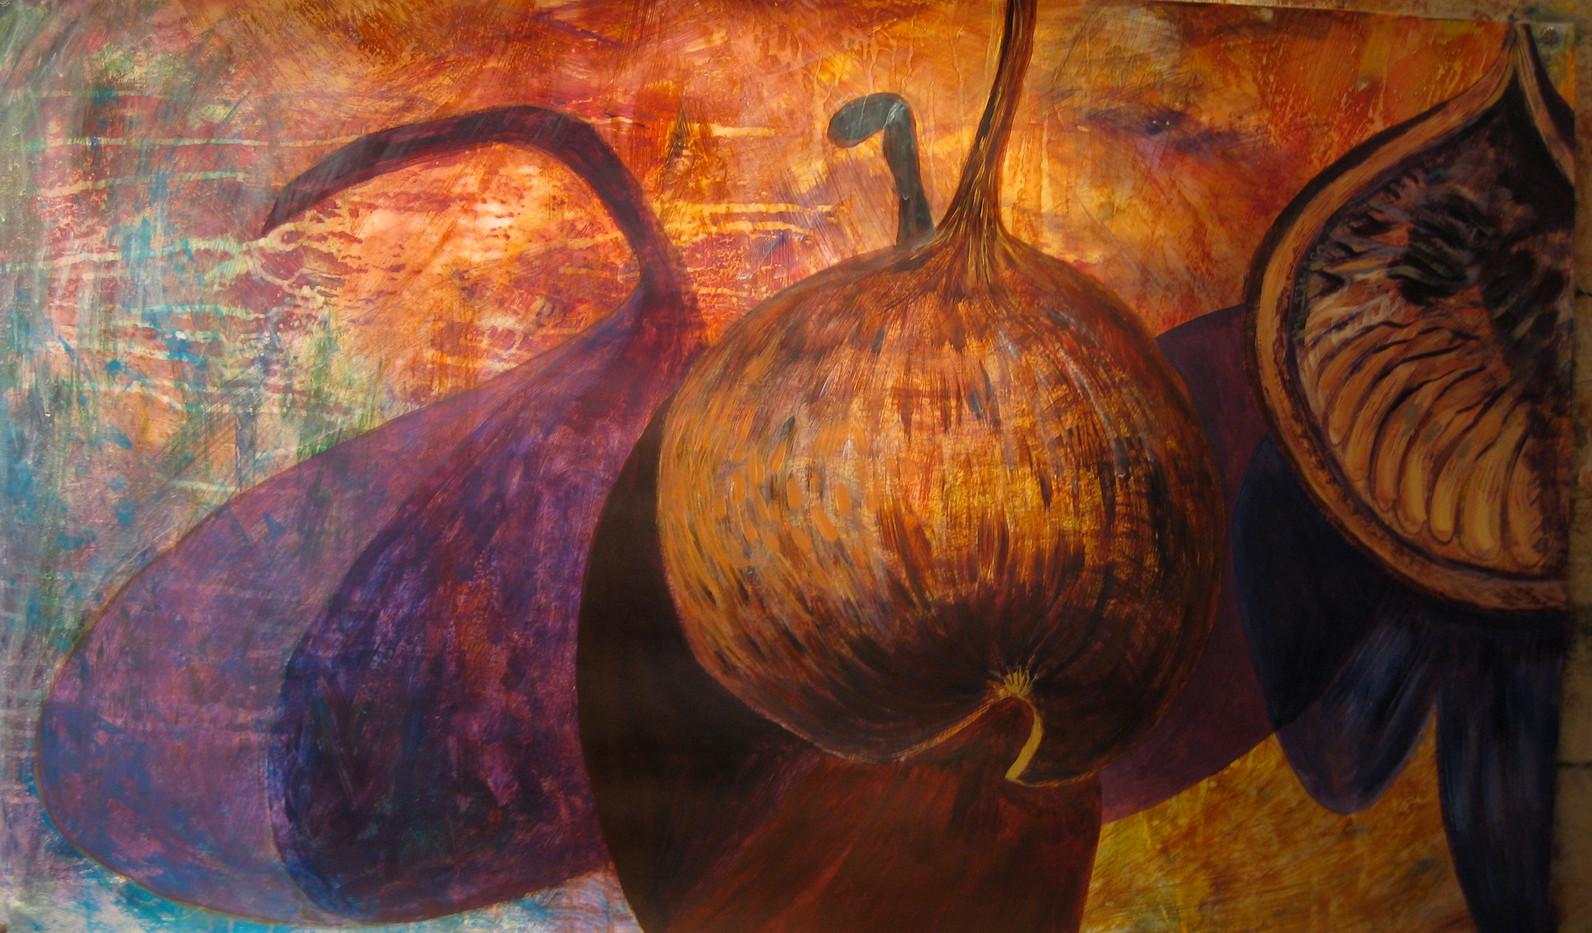 Mixed media painting